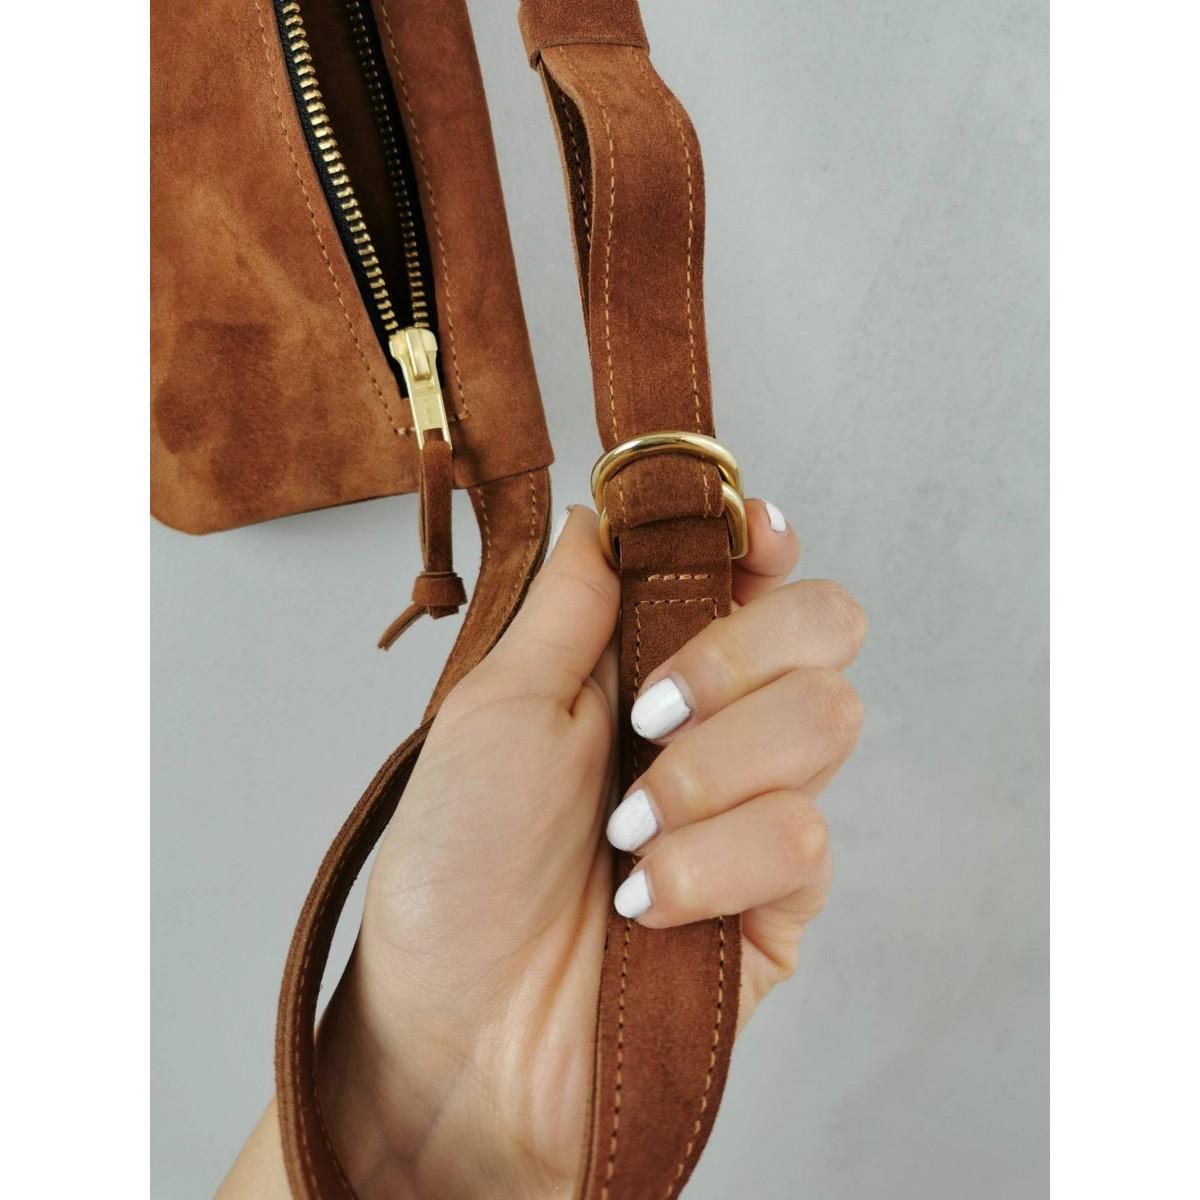 Wildleder Gürteltasche // Hüfttasche // Hip bag // Fanny Pack // Crossbody // suede leather bag // Slouchy